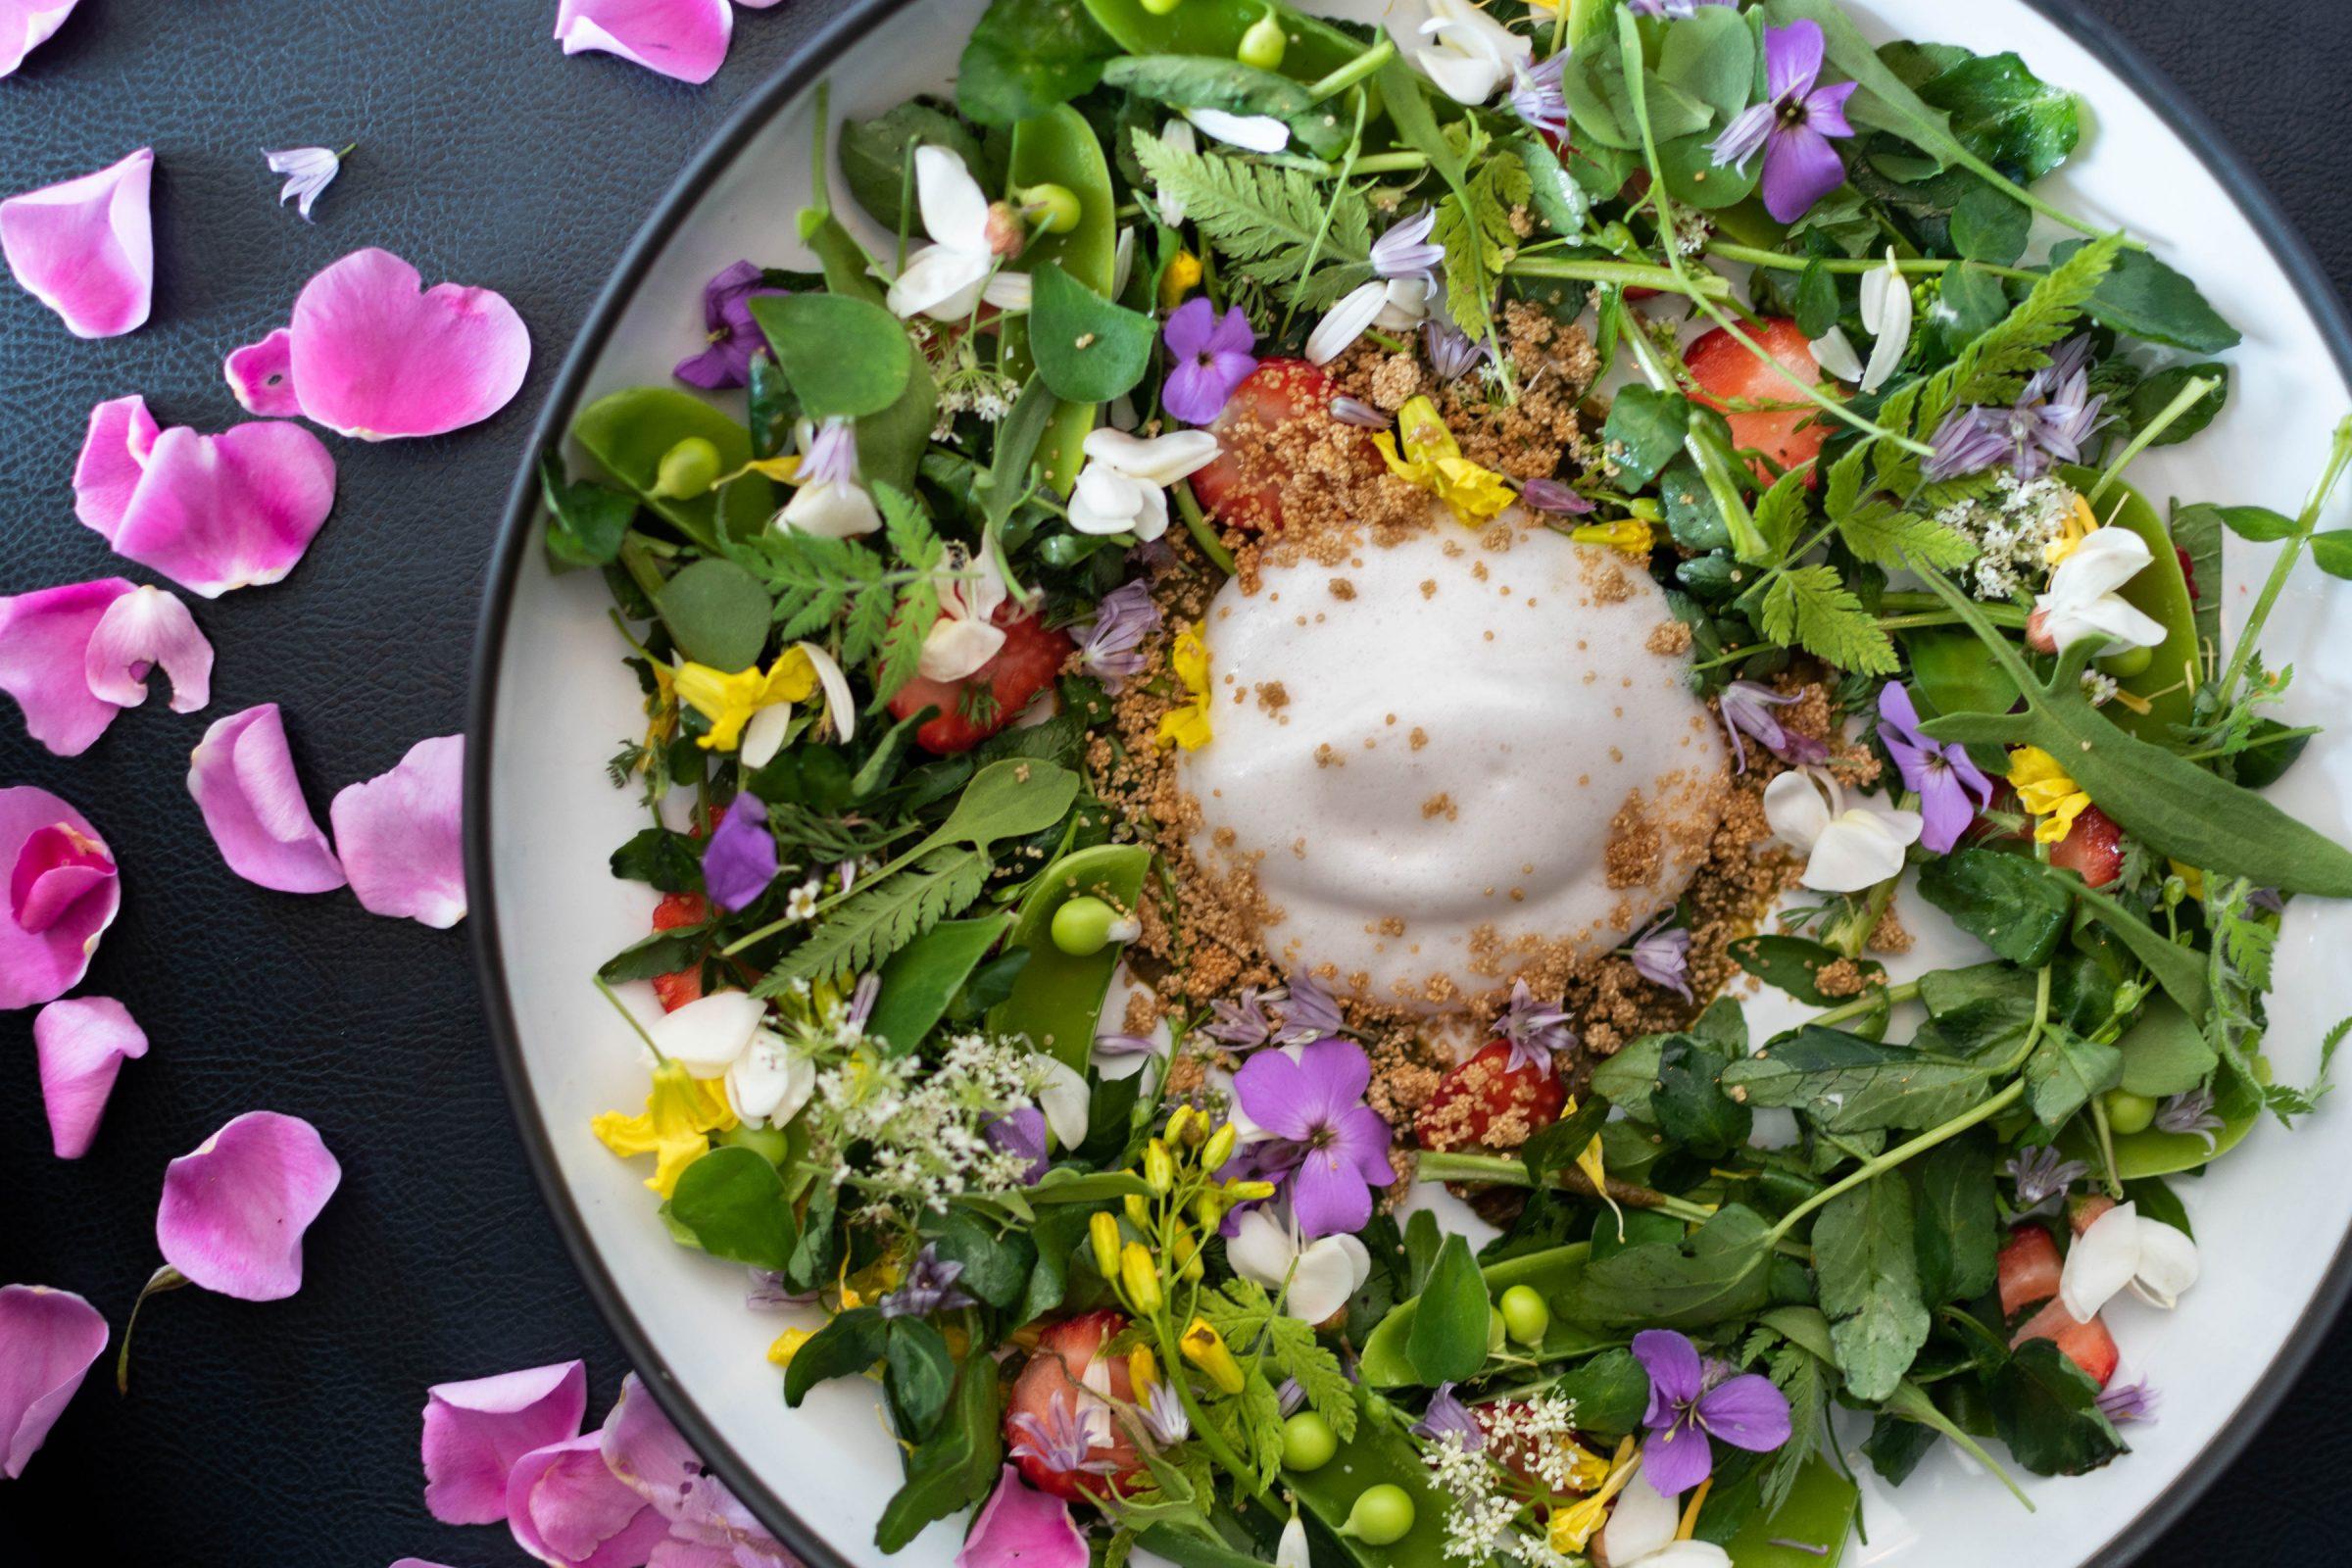 Spring Salad - The Courtney Room - Victoria Restaurants